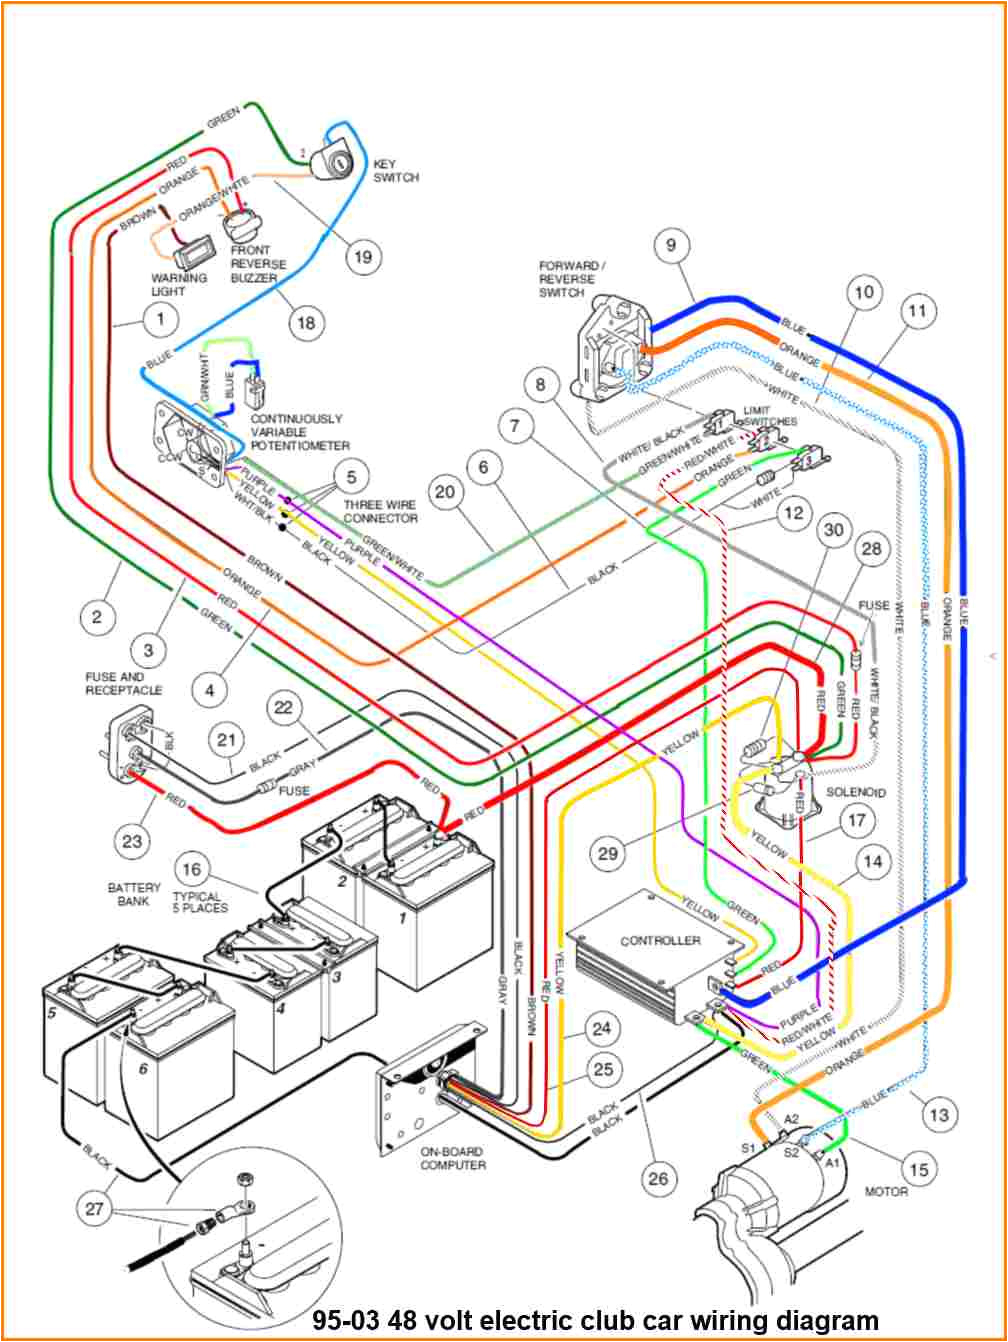 x50 wiring diagram wiring diagram x5 wiring diagrams wiring diagram 65c 10 truck wiring diagram nametiger